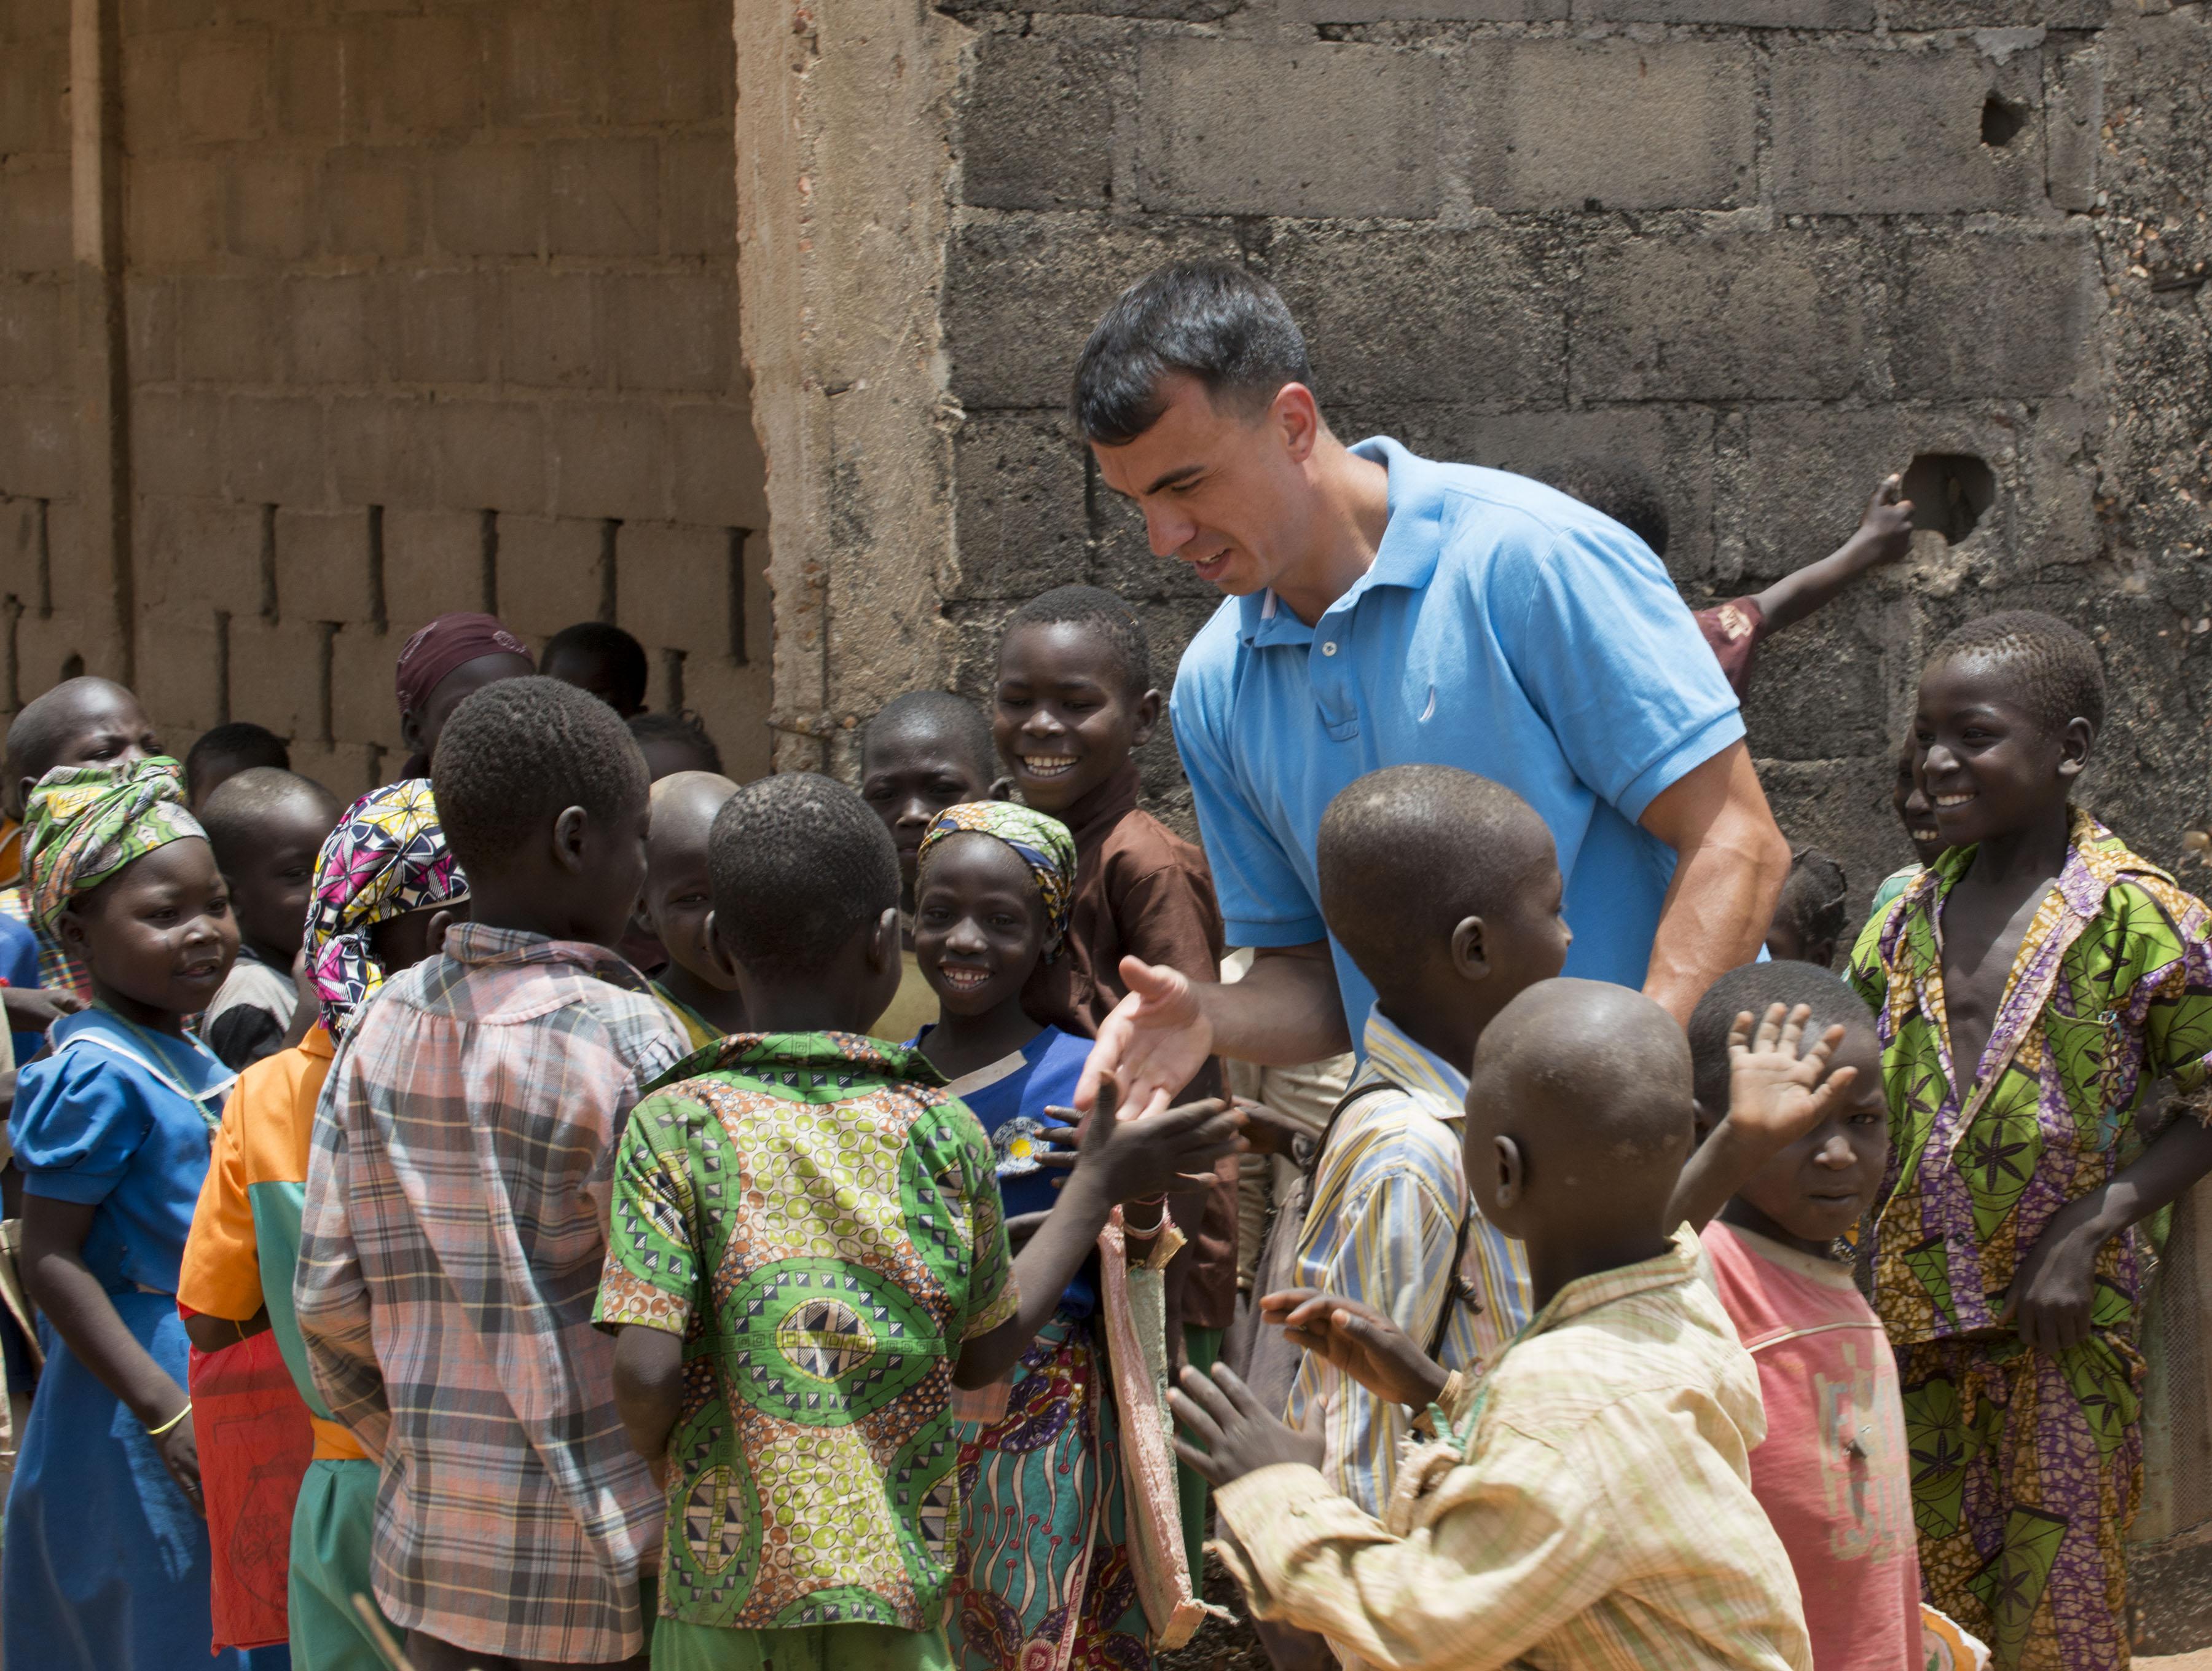 Civil Affairs Sgt. 1st Class Sean Acosta in Cameroon